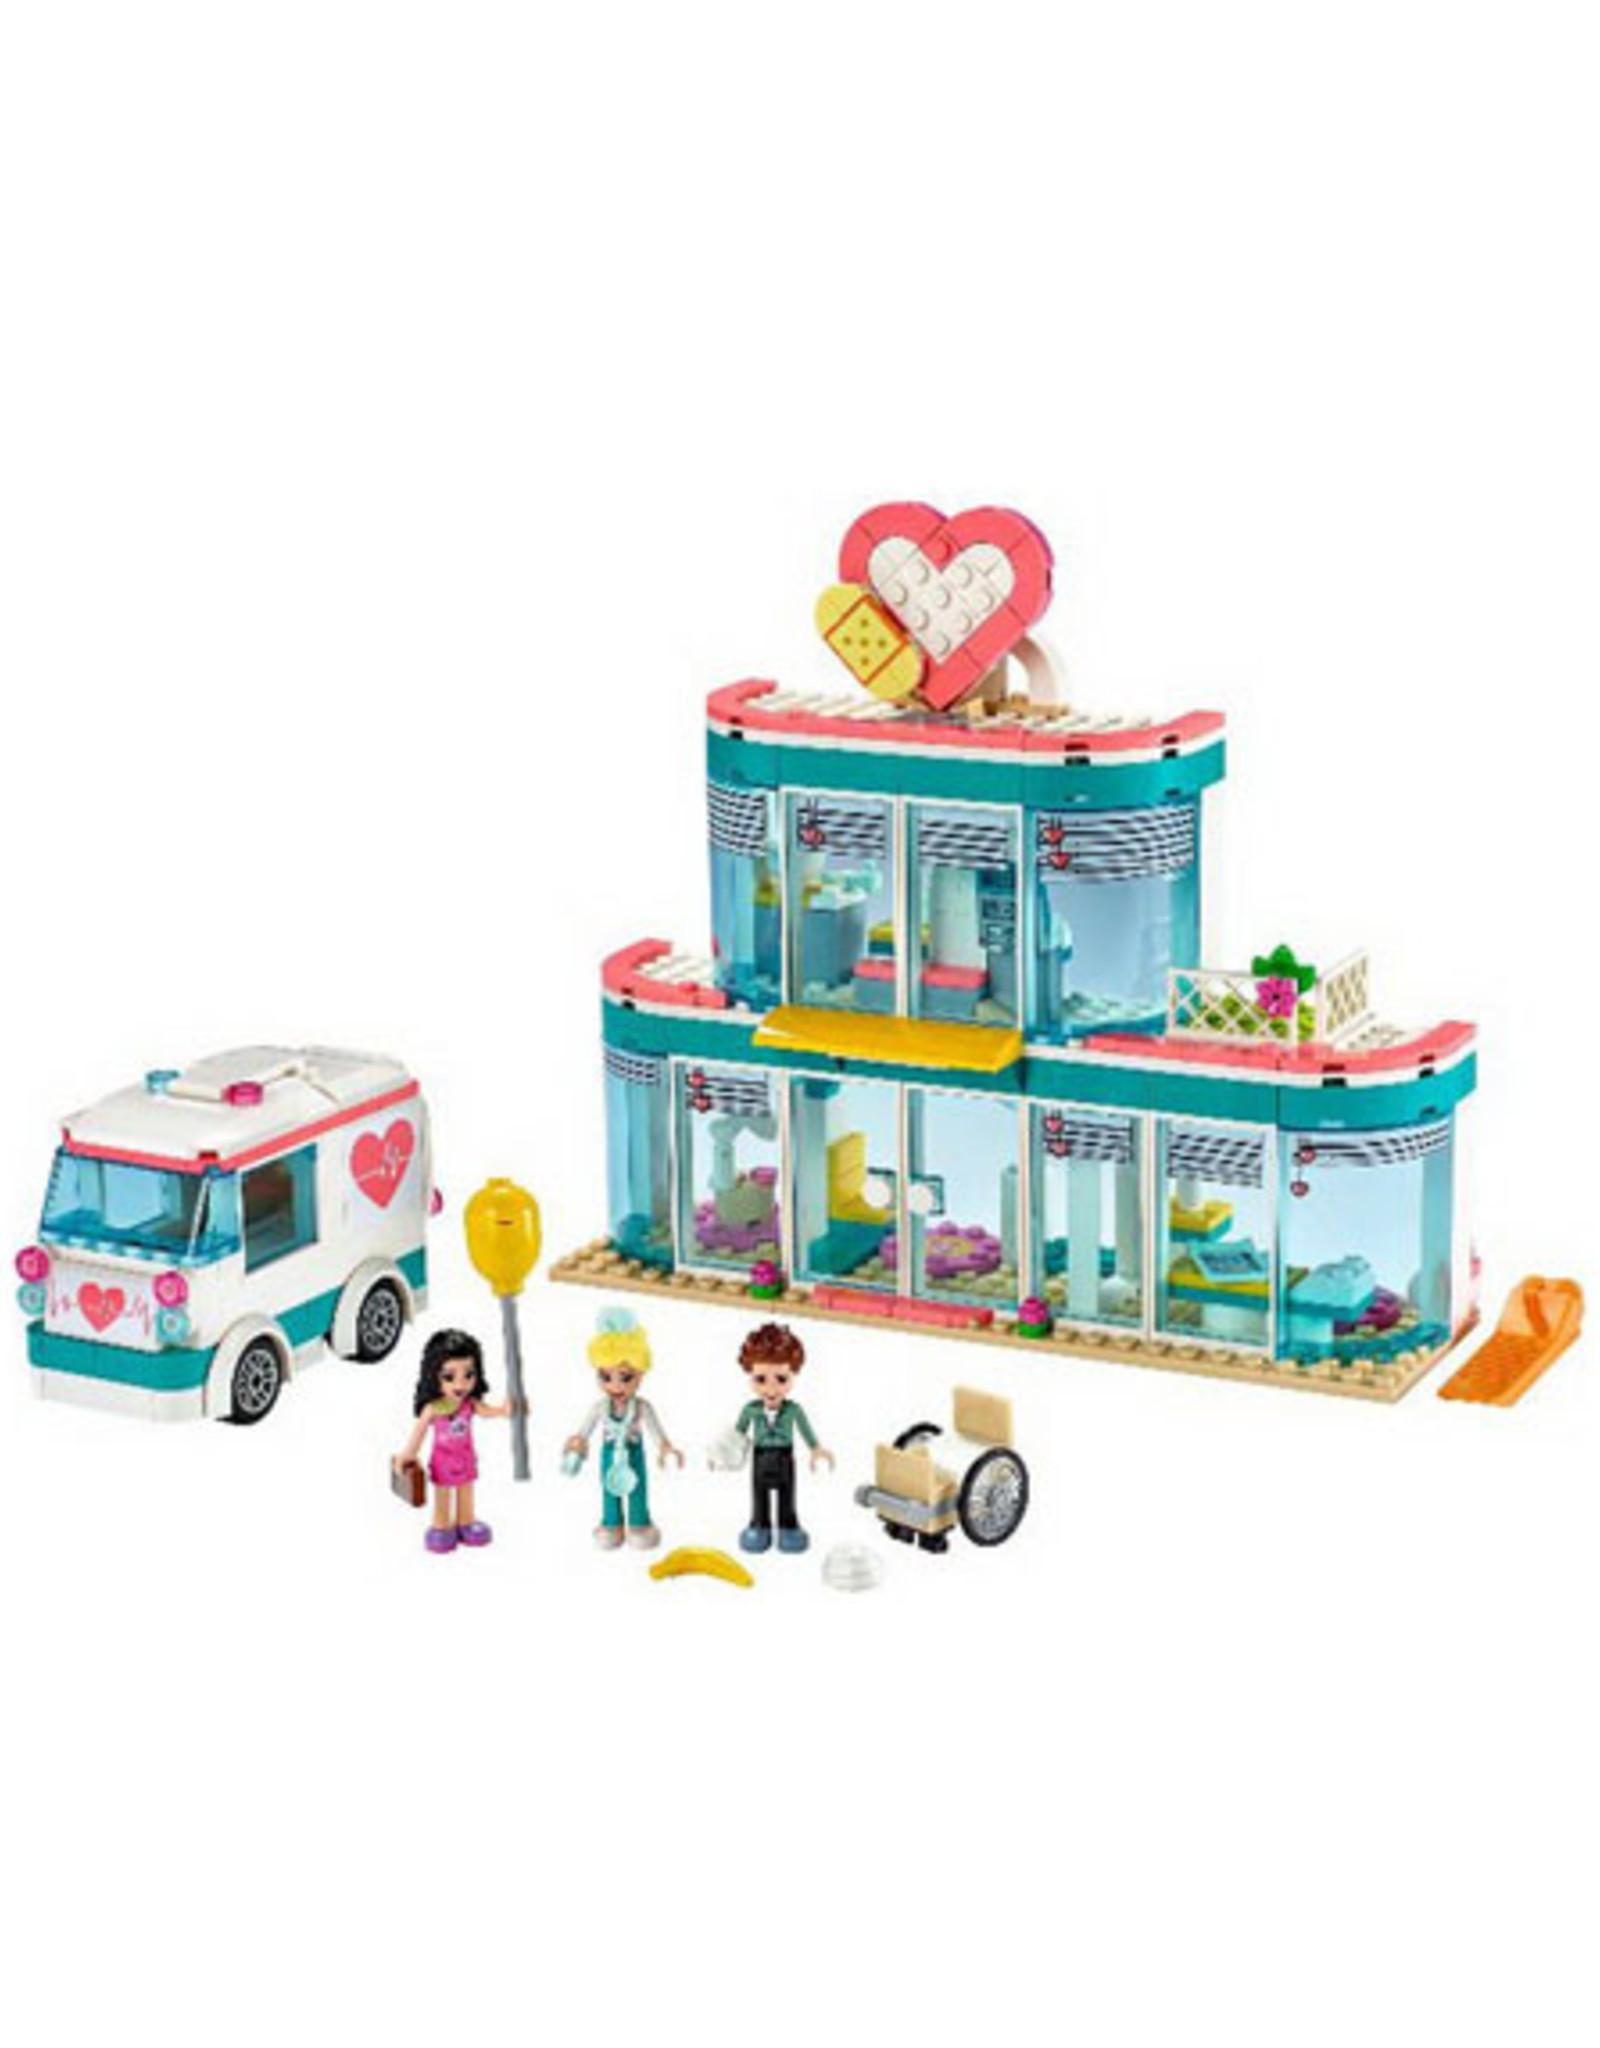 LEGO LEGO 41394 Heartlake City Hospital FRIENDS